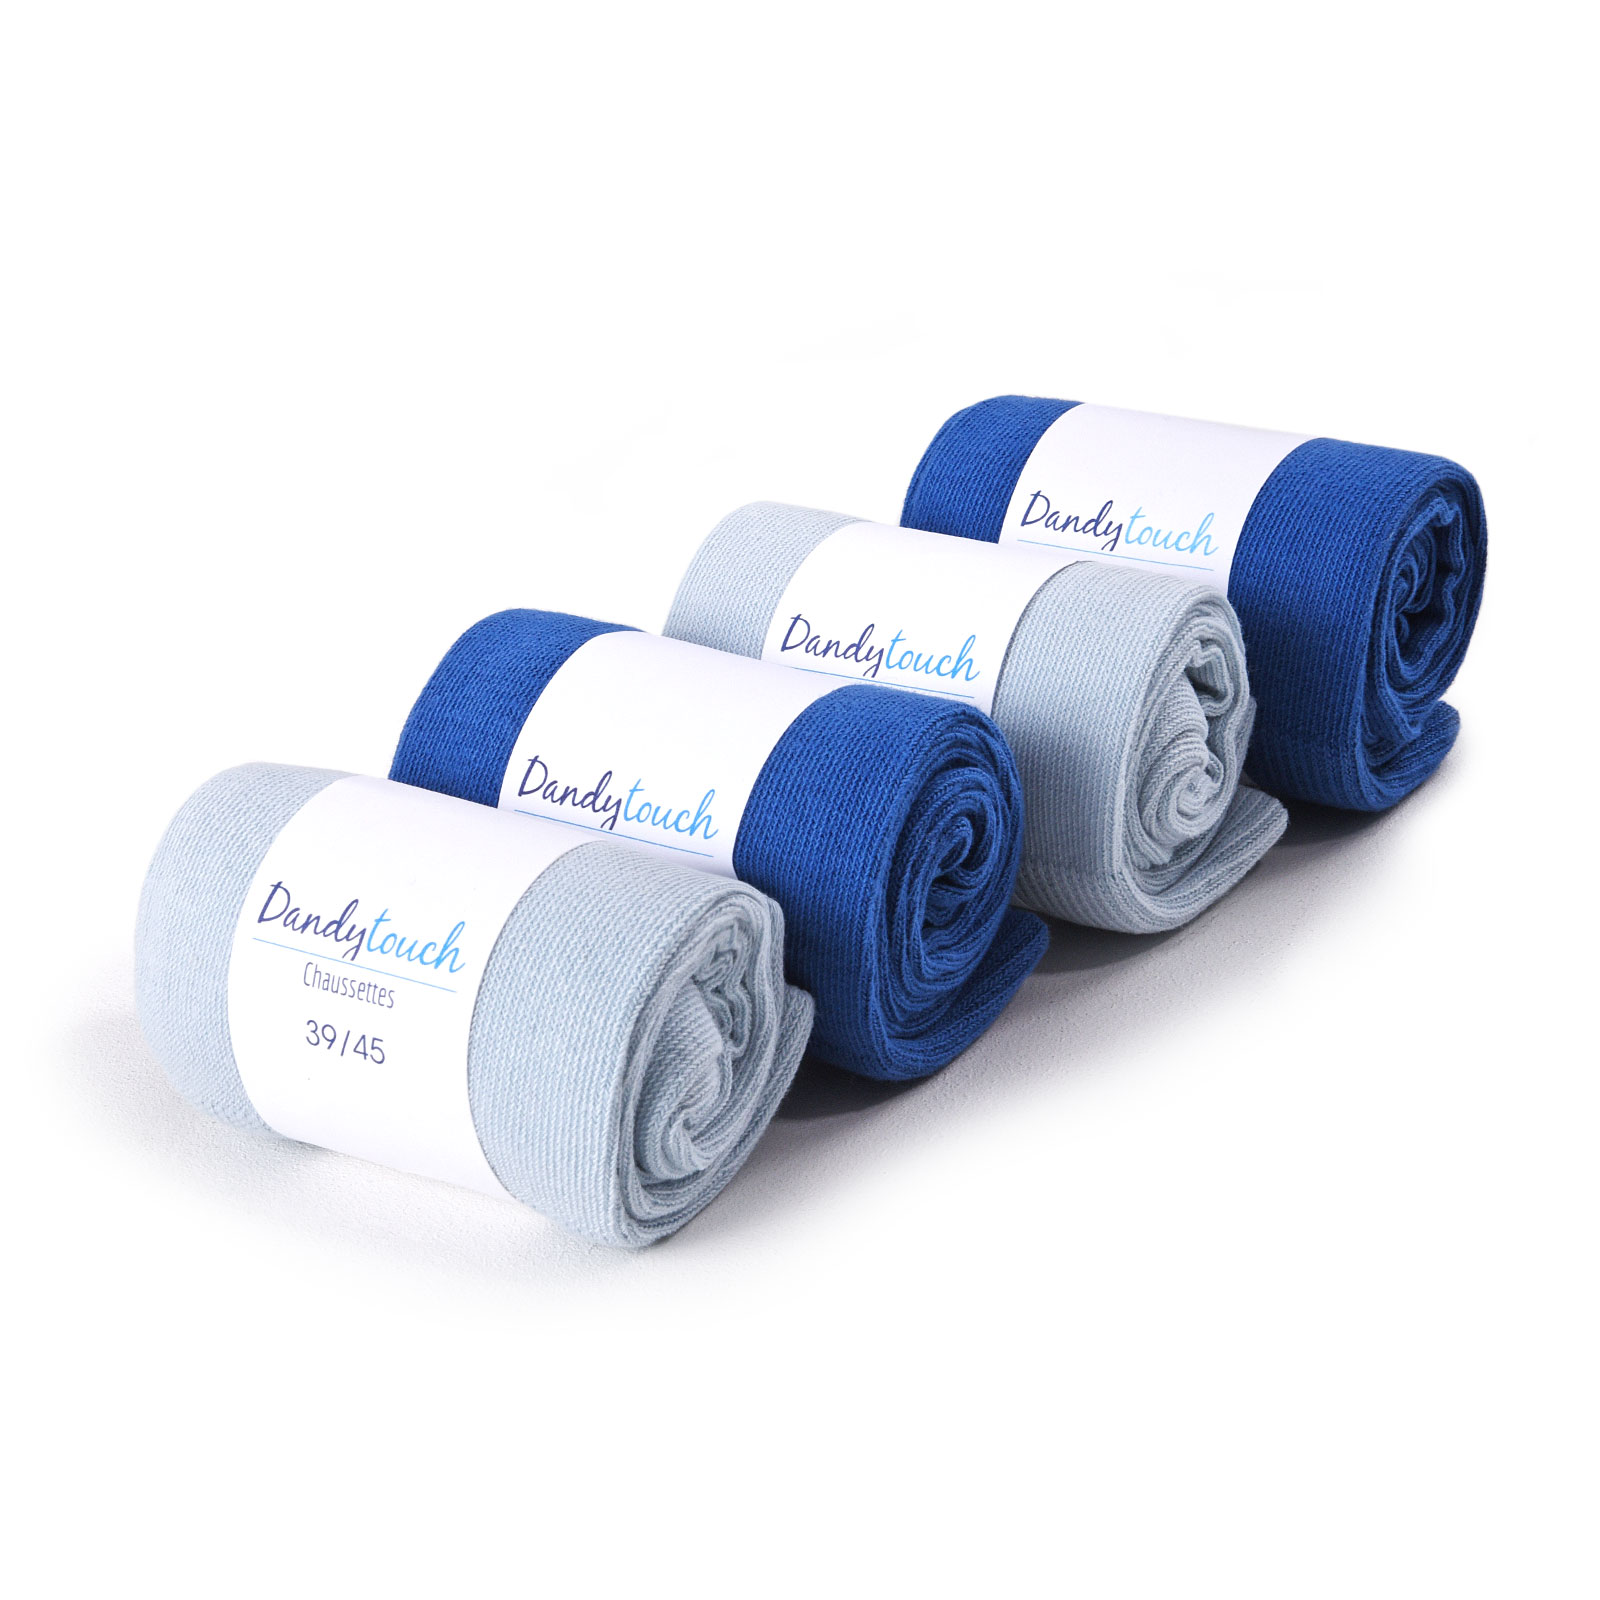 PK-00061-F16-assortiment-chaussettes-bleues